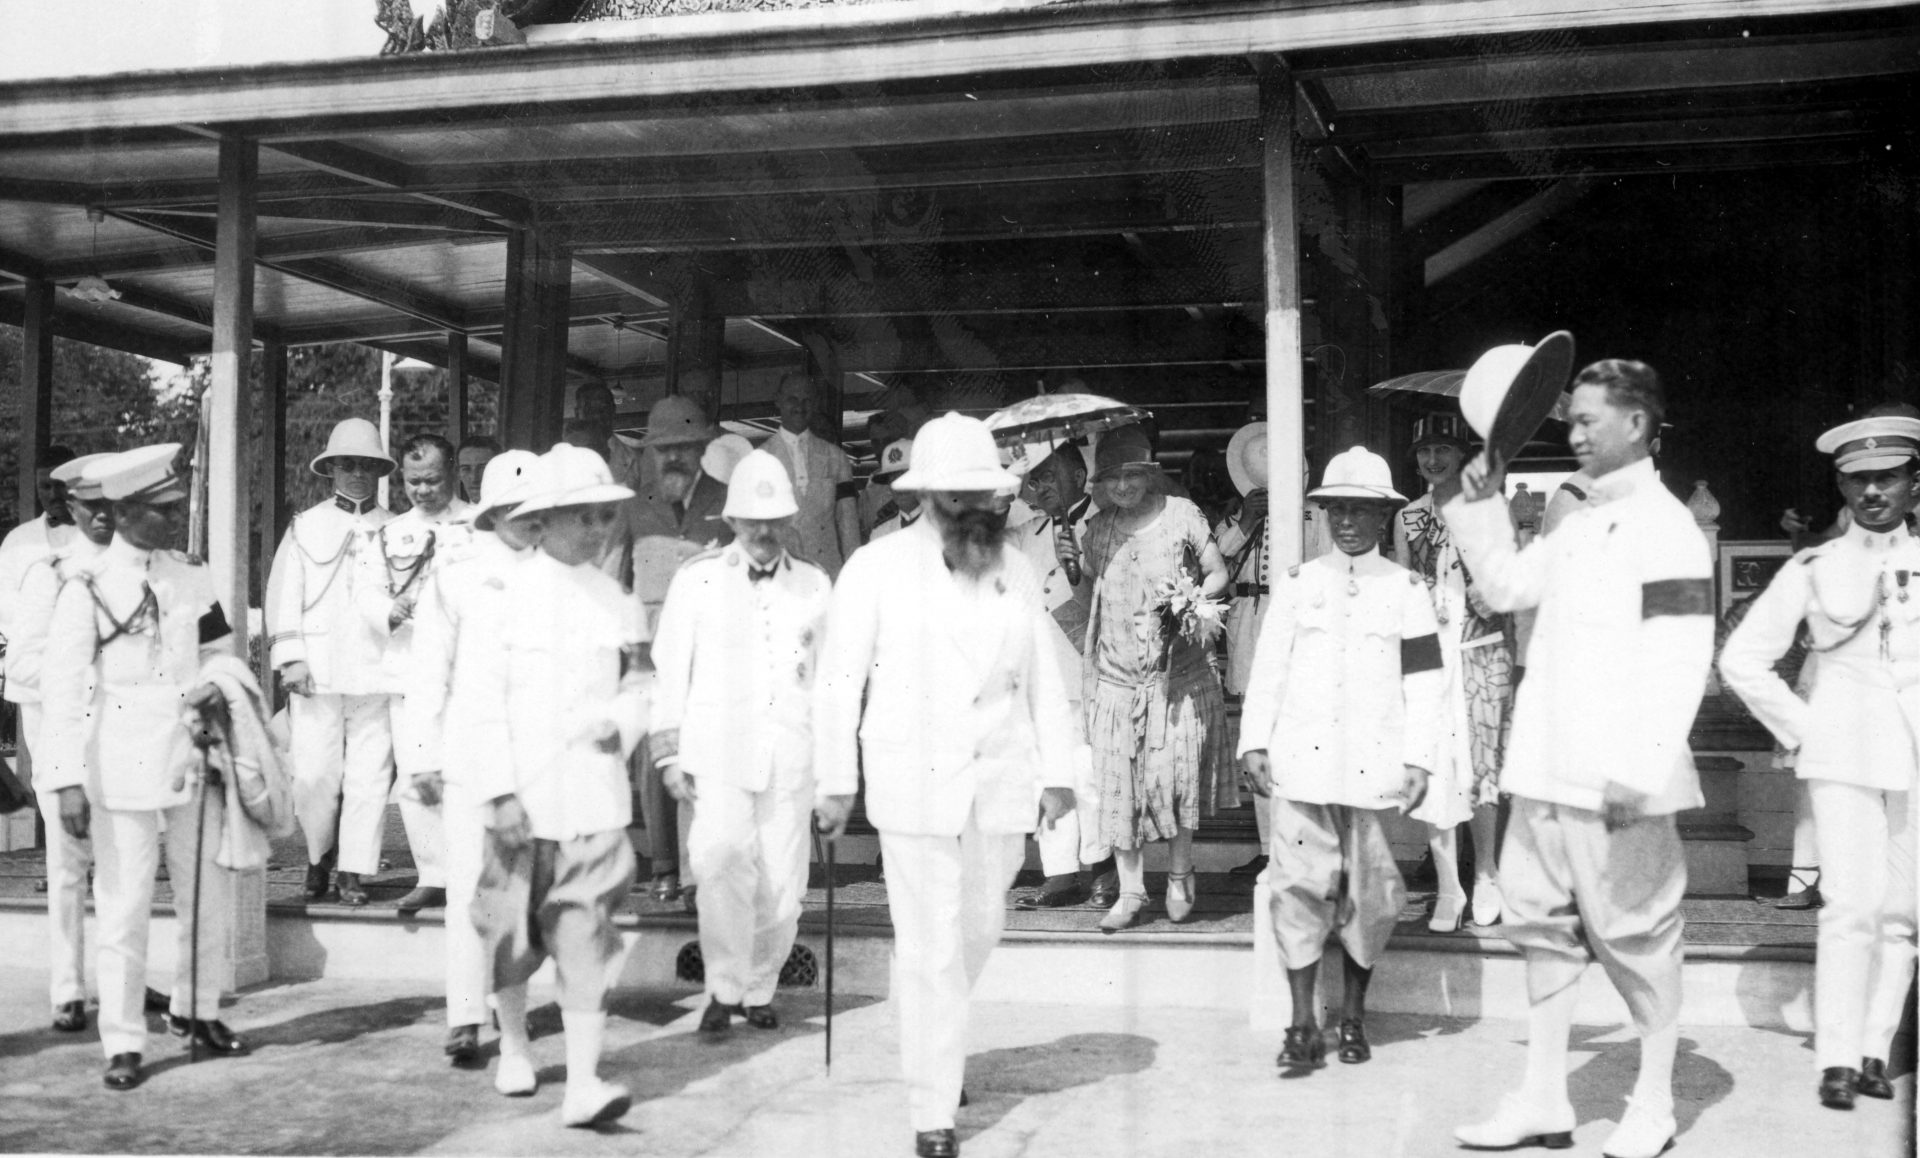 Alexandre Varenne, au premier plan au milieu - Bangkok, Août 1926